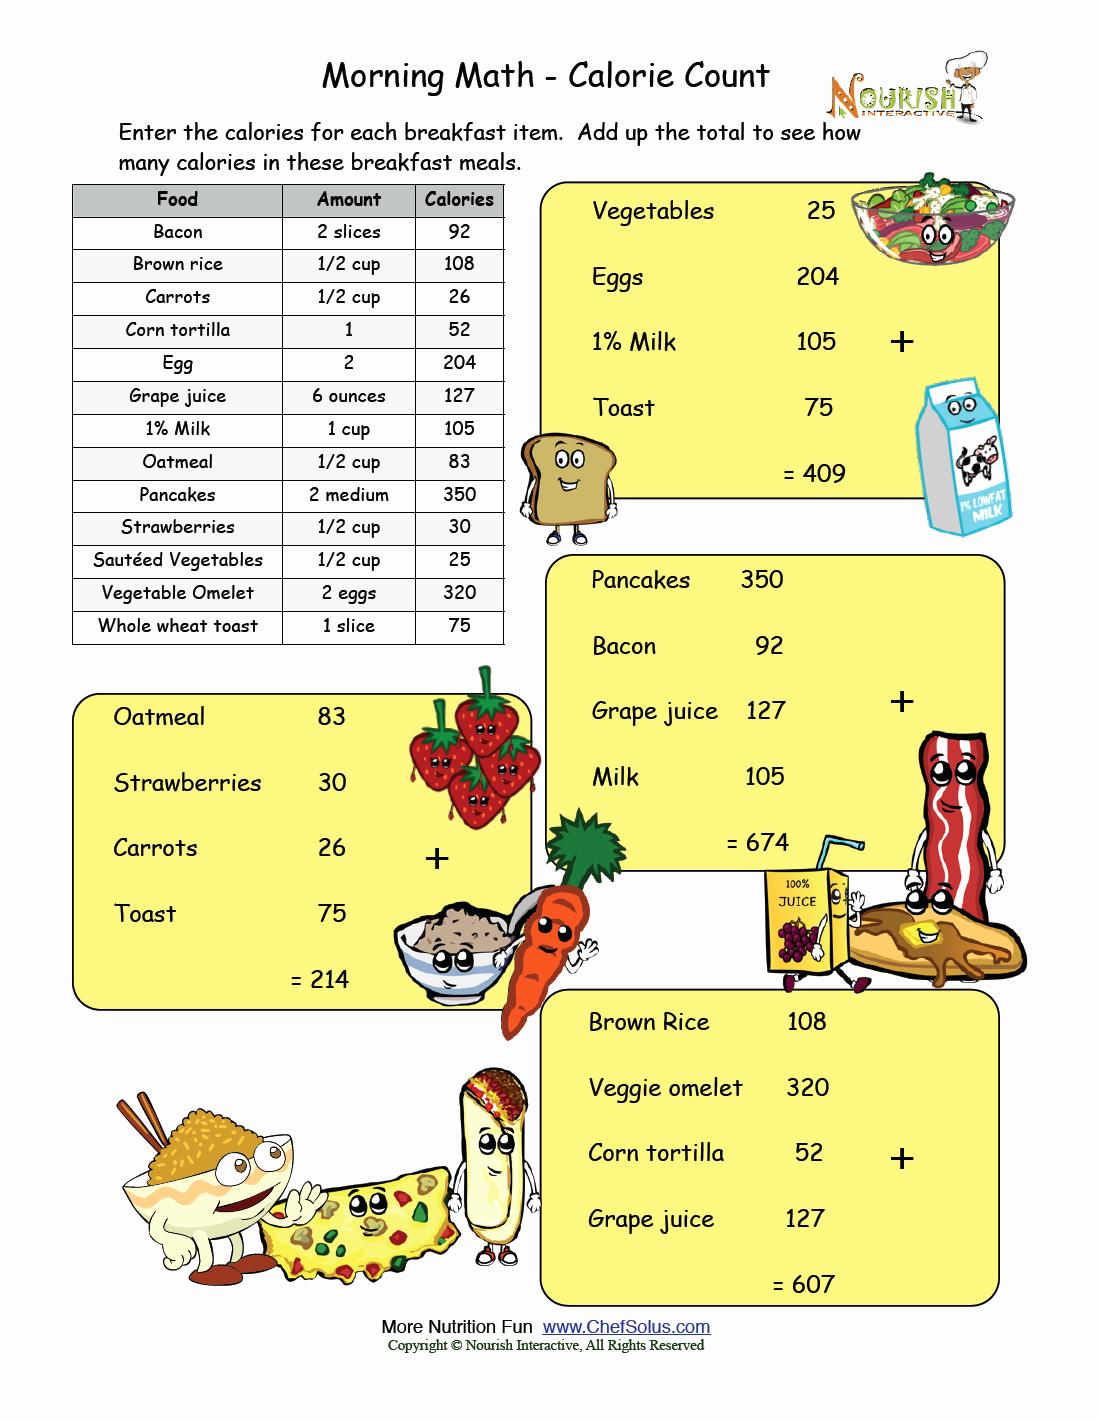 Nutrition Label Worksheet Answer Key Luxury Hey King Get F Our Backs Worksheet Answer Key